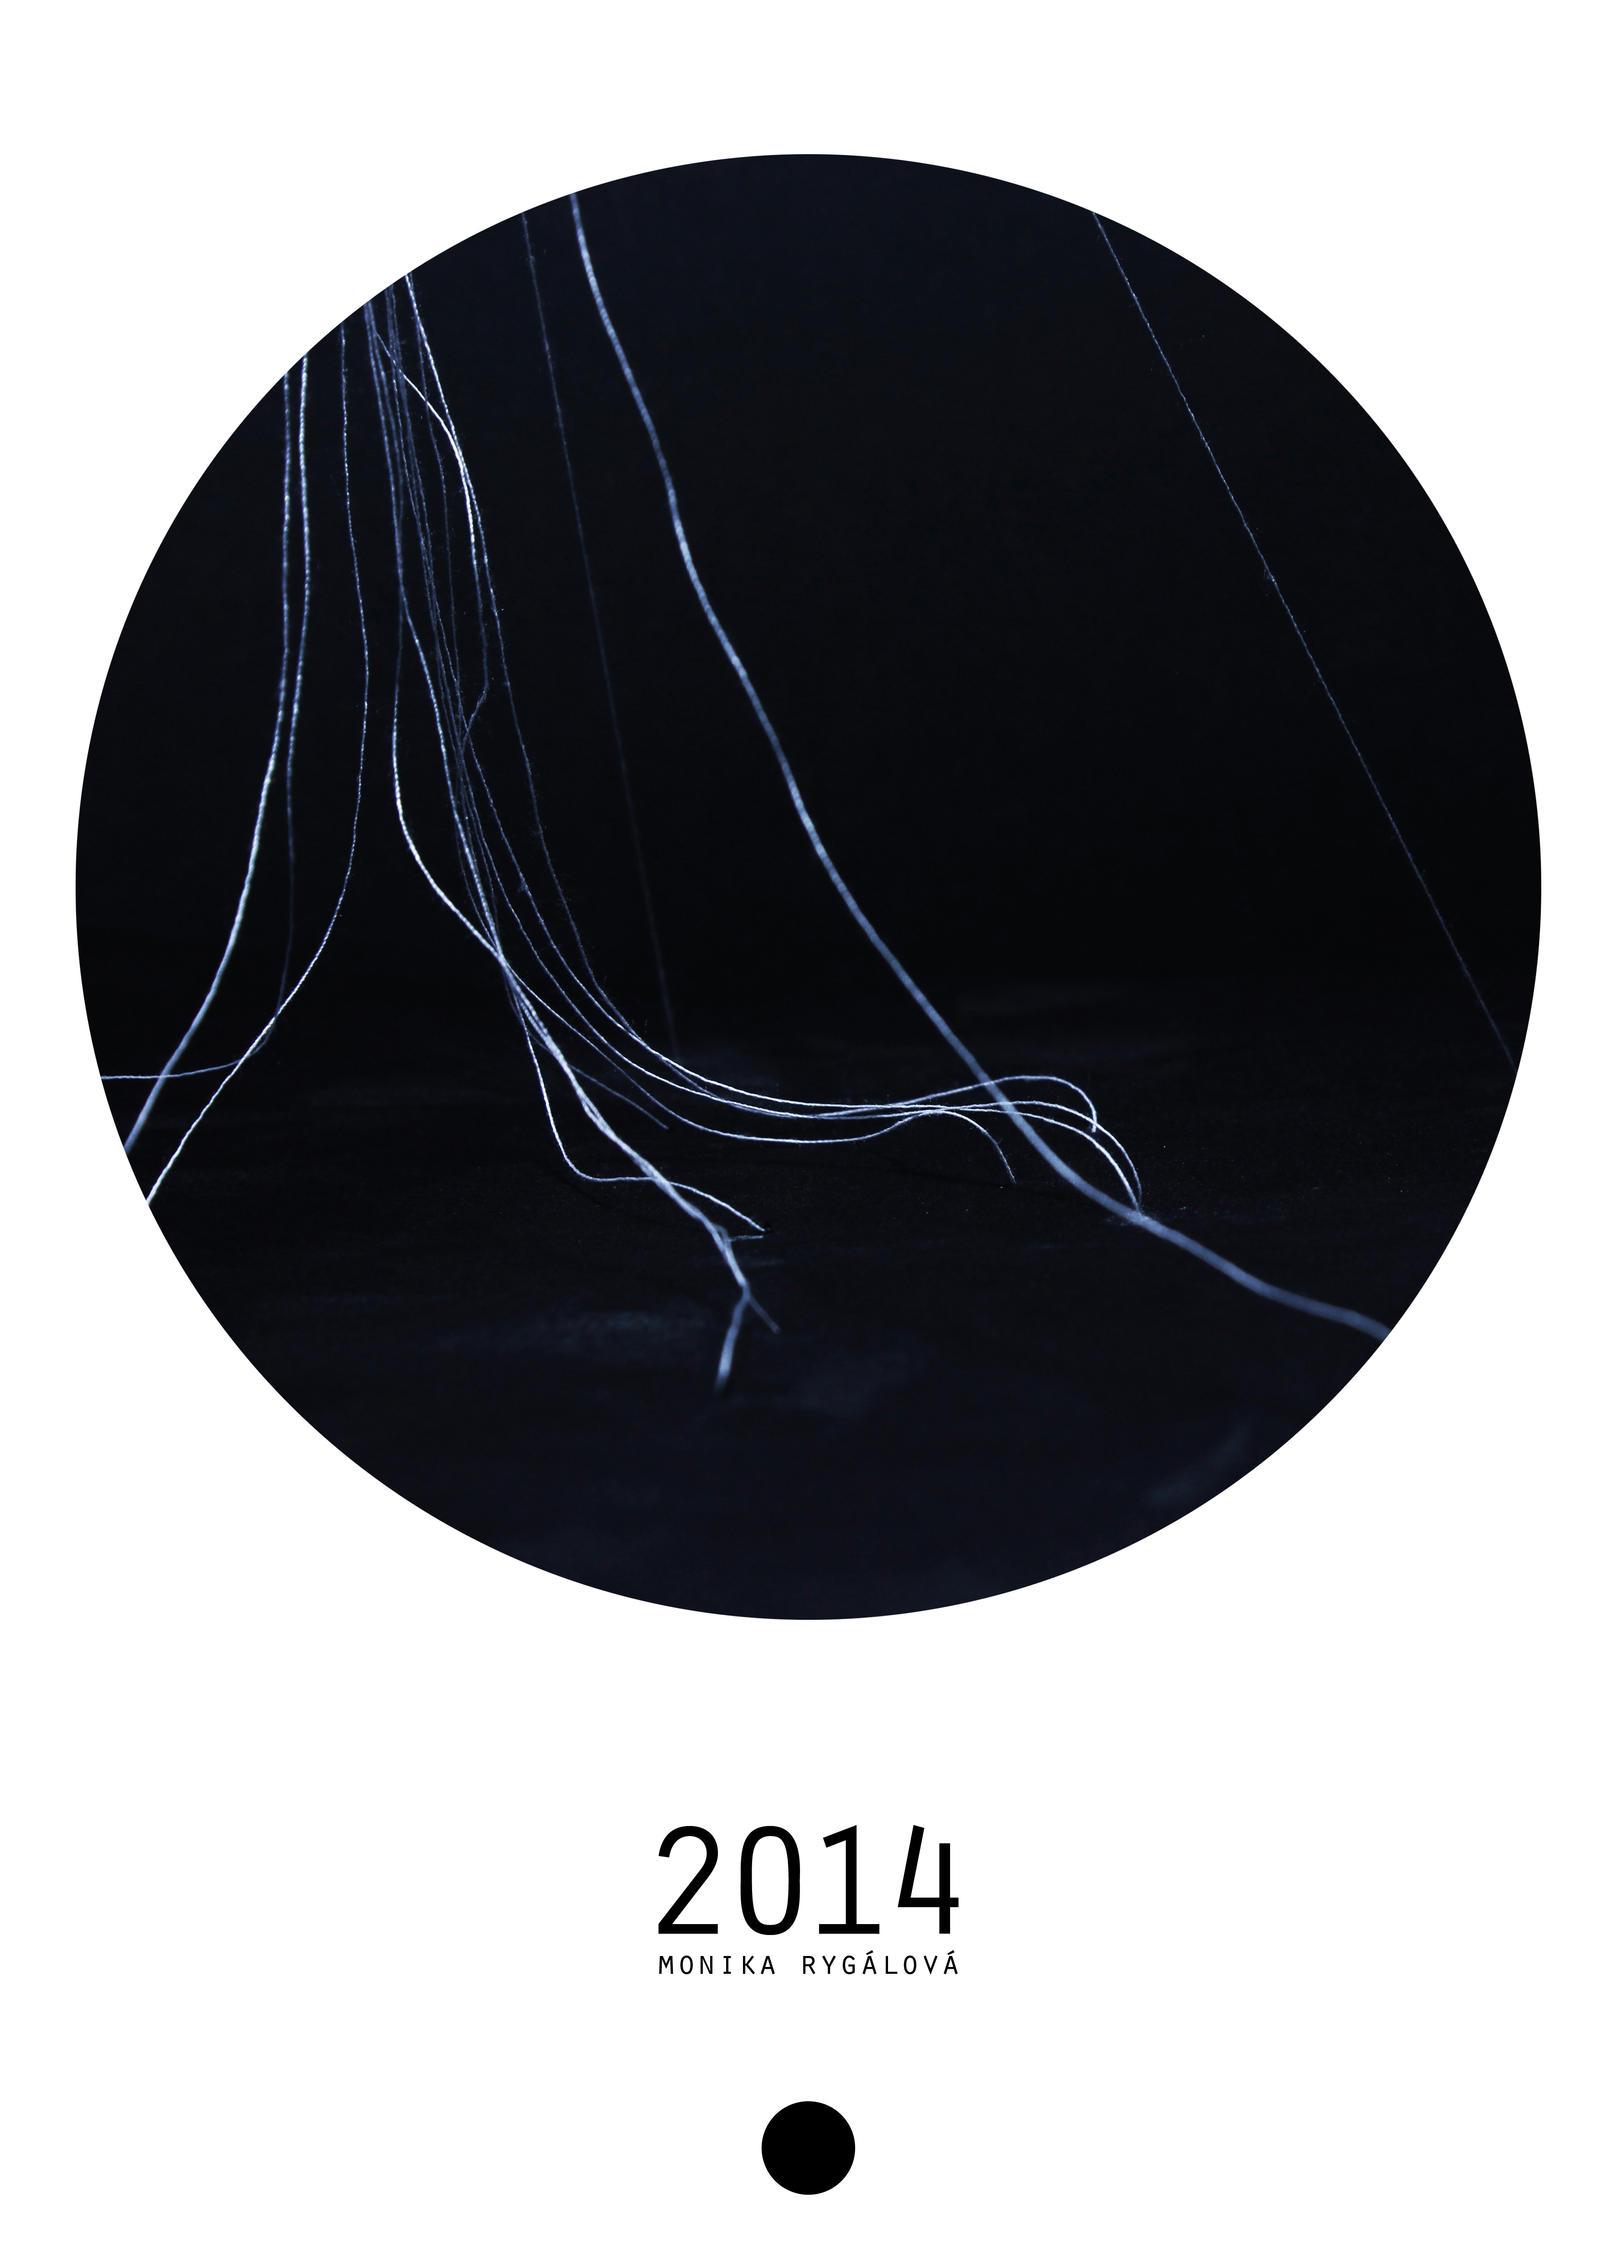 Calendar Cover Design 2014 : Cover design calendary by mrs kethlines monc on